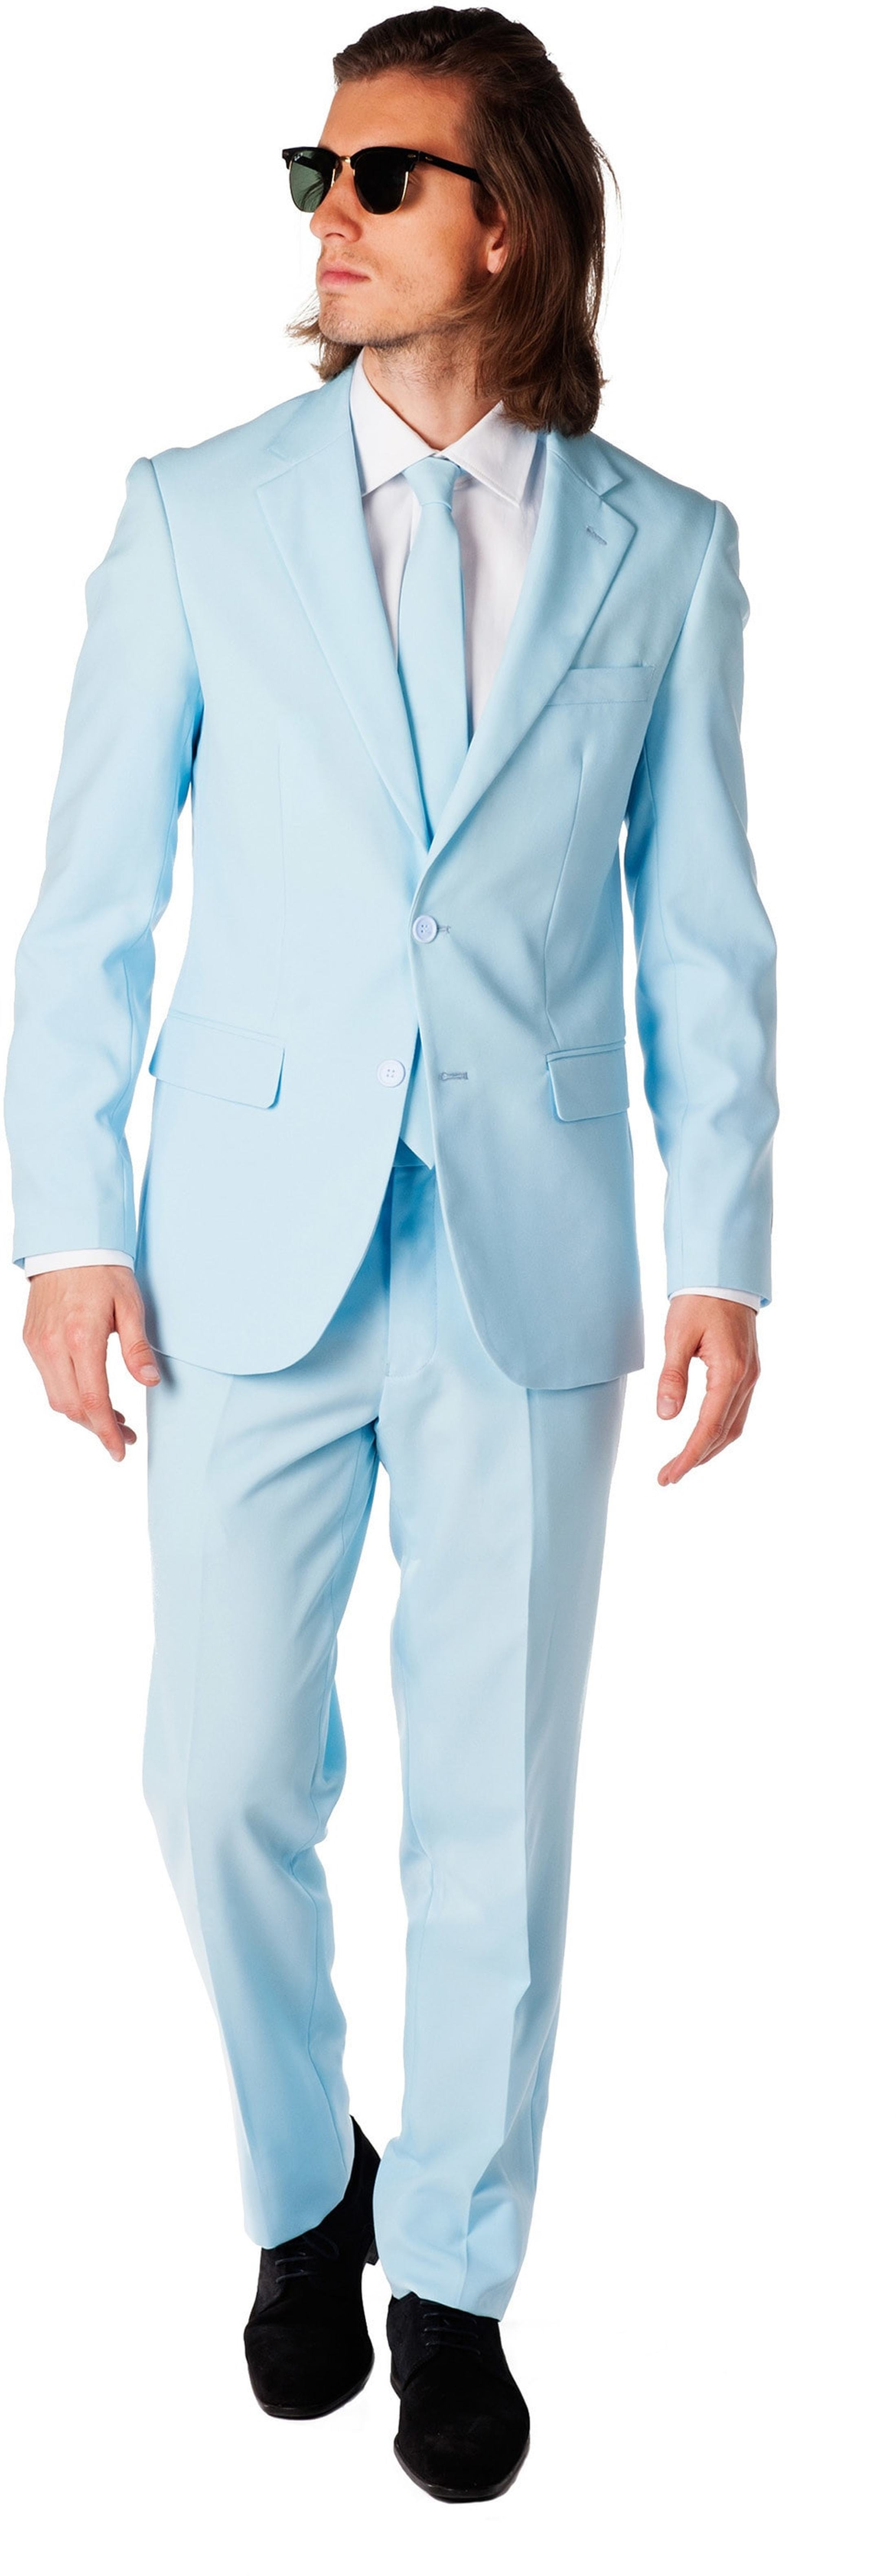 OppoSuits Cool Blue Kostüm foto 0